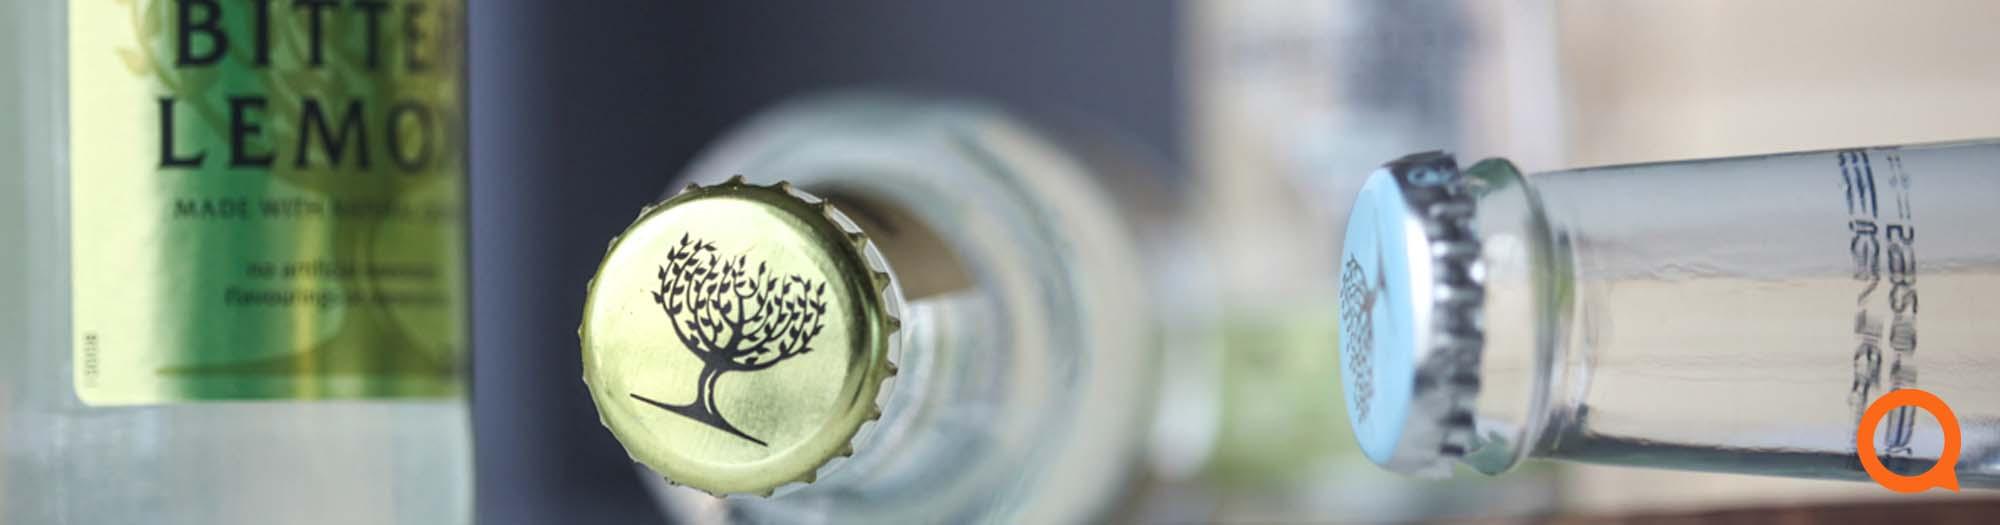 Frisdranken & sap